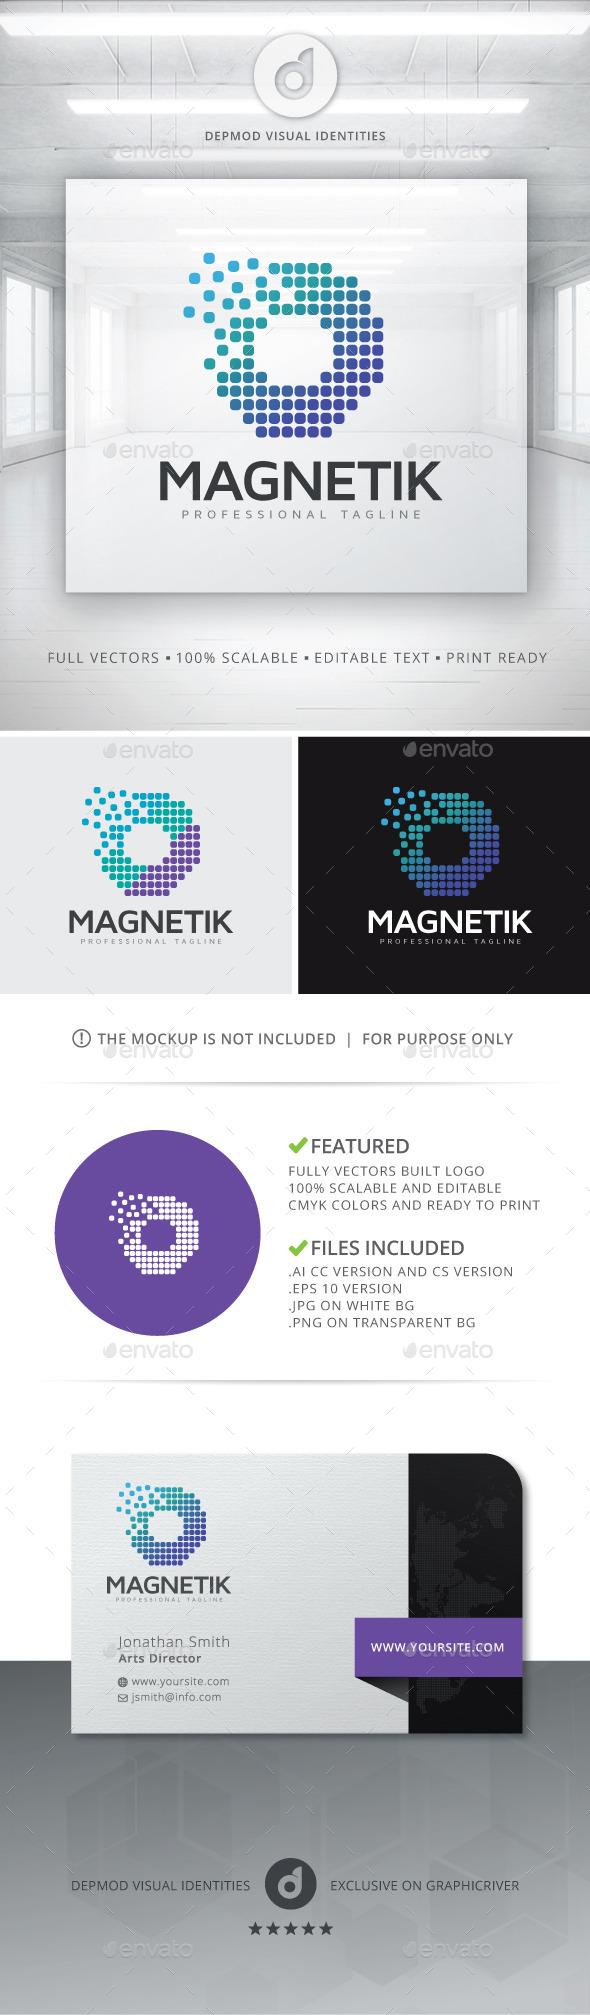 GraphicRiver Magnetik Logo 10754276